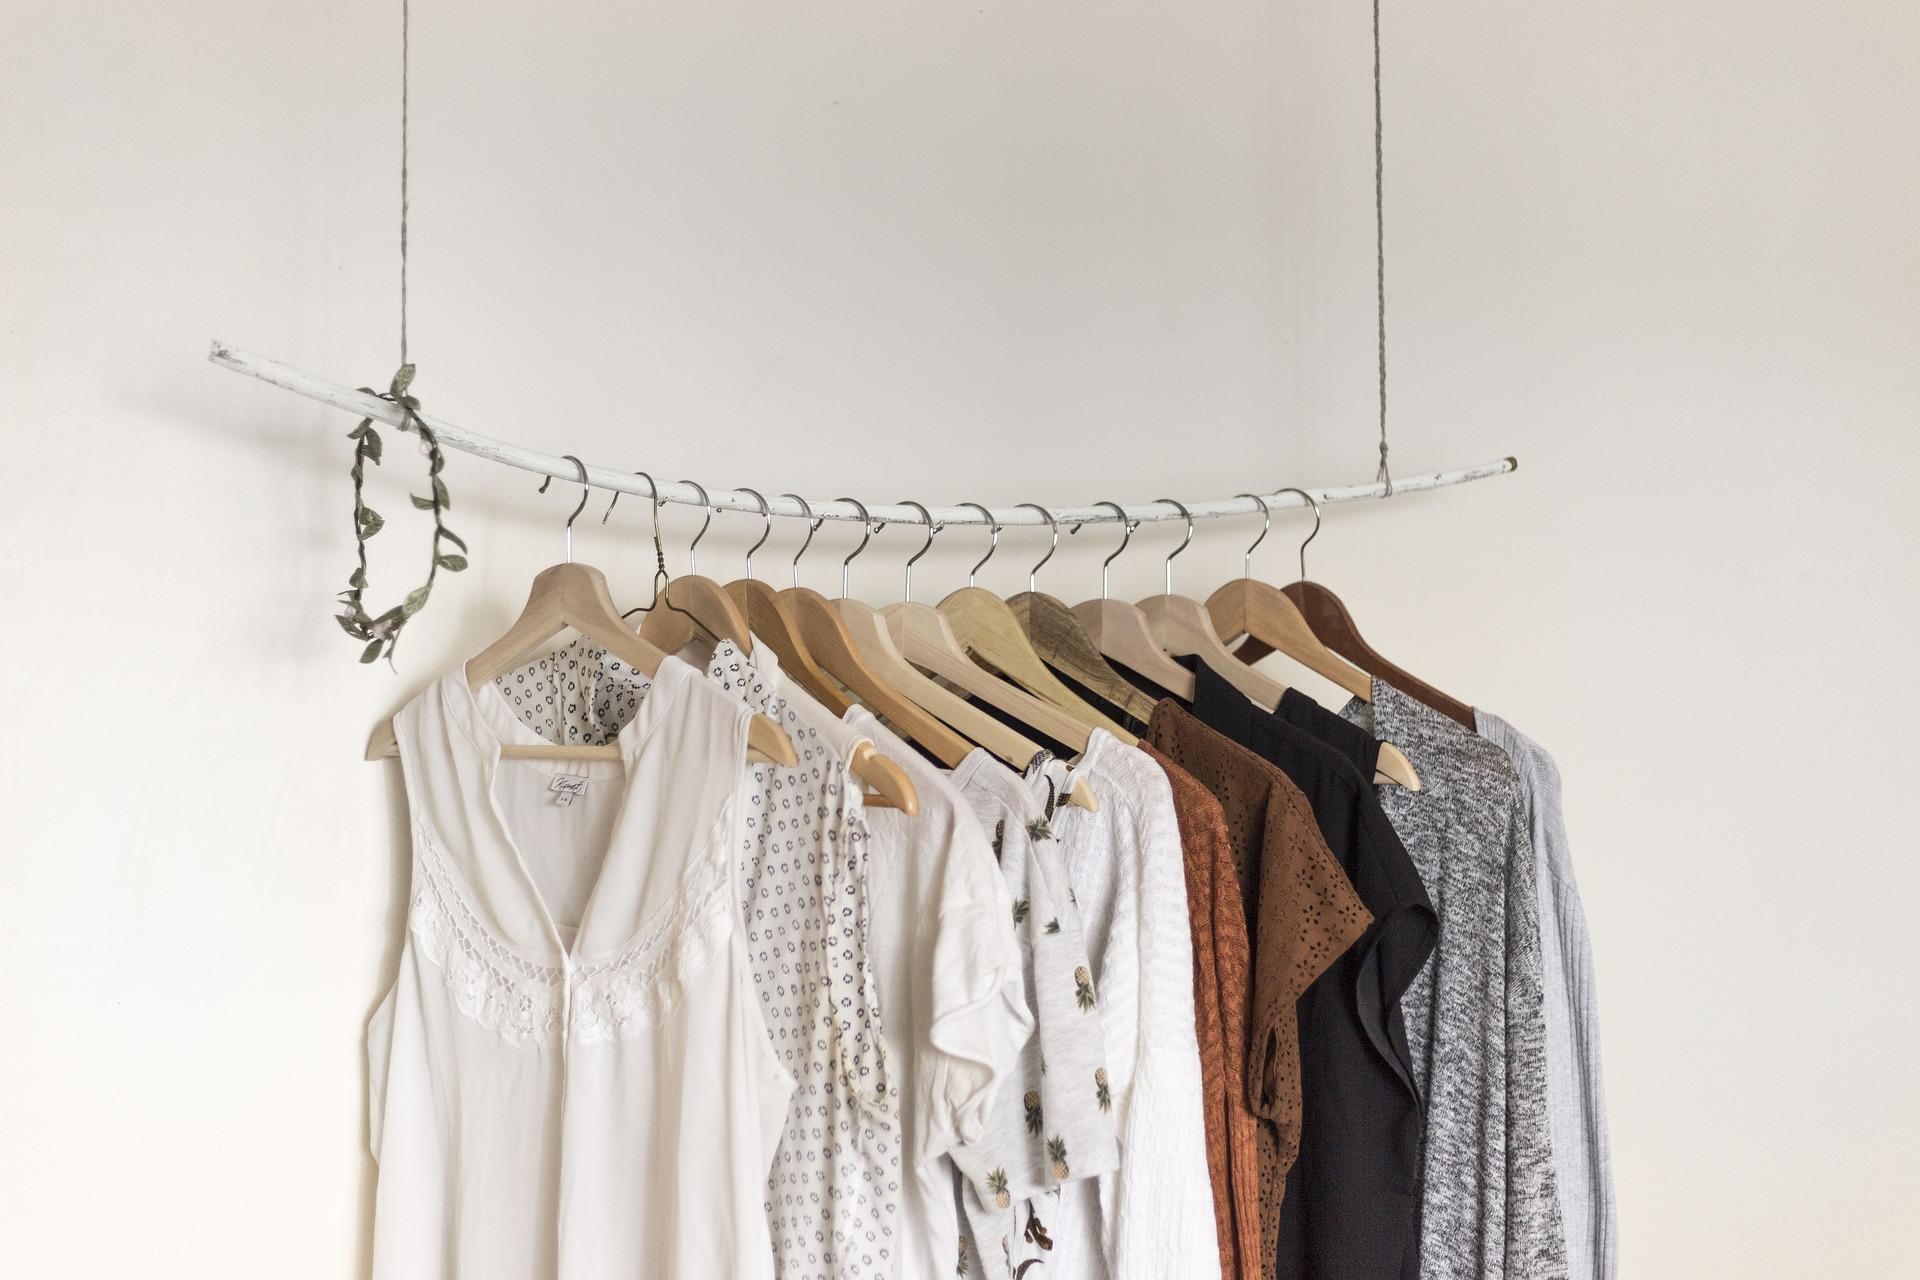 Alquilar ropa